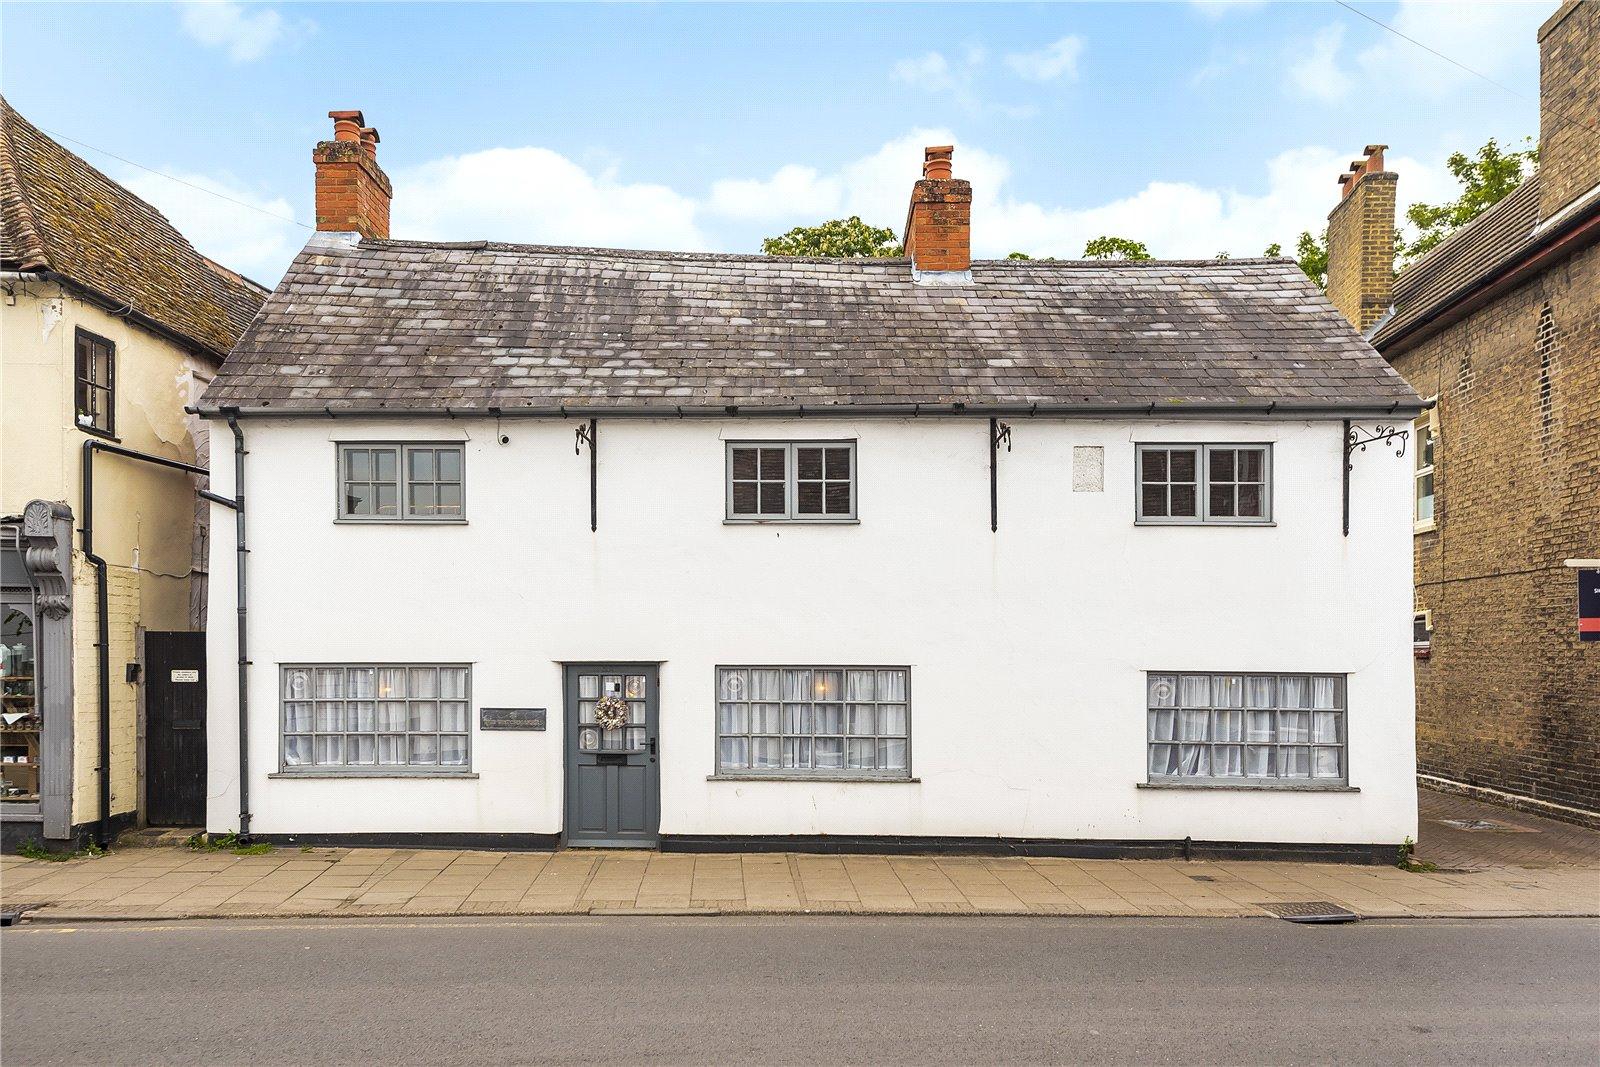 4 bed house for sale in St. Marys Street, Eynesbury, PE19